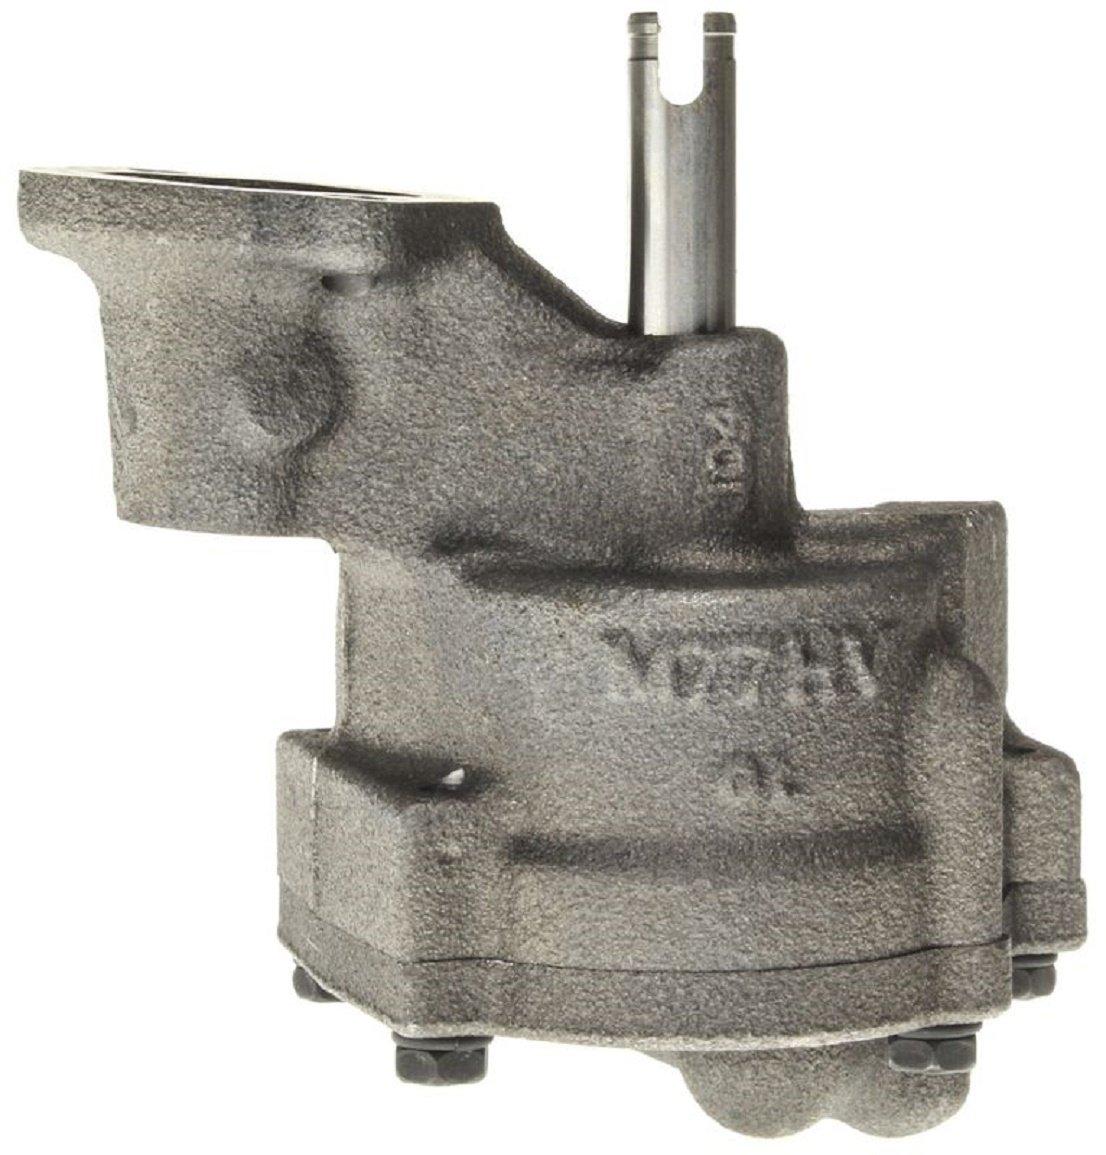 MEL M77HV Big Block Chevy Melling 396 427 454 Oil Pump M77HV BBC